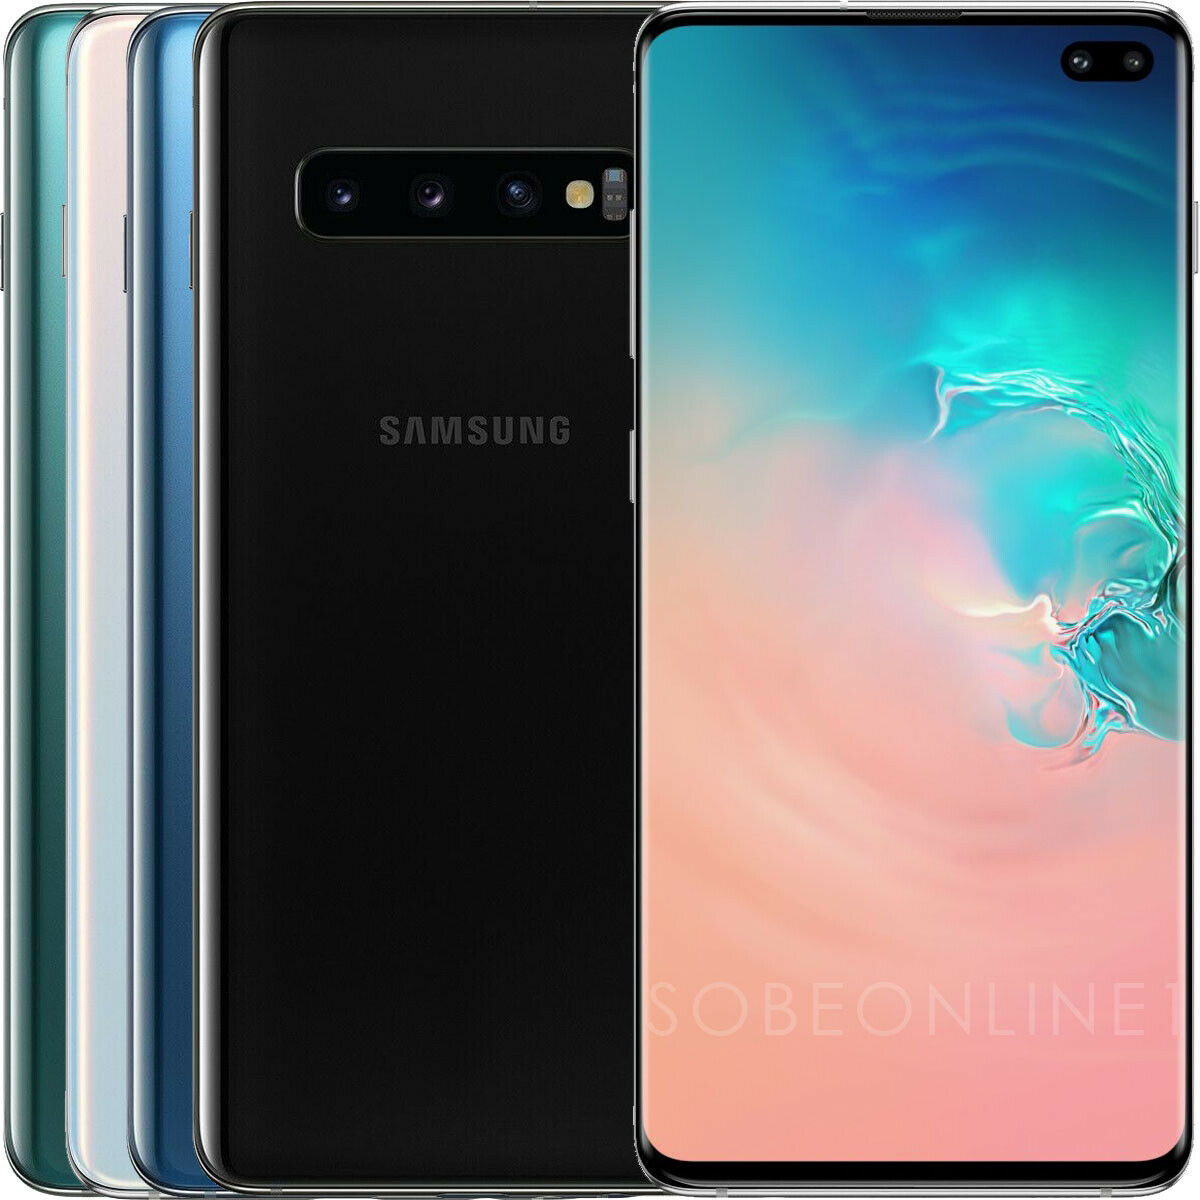 Samsung Galaxy S20+ Plus 128GB 8GB RAM 5G SM-G986B/DS (FACTORY UNLOCKED) 6.7″